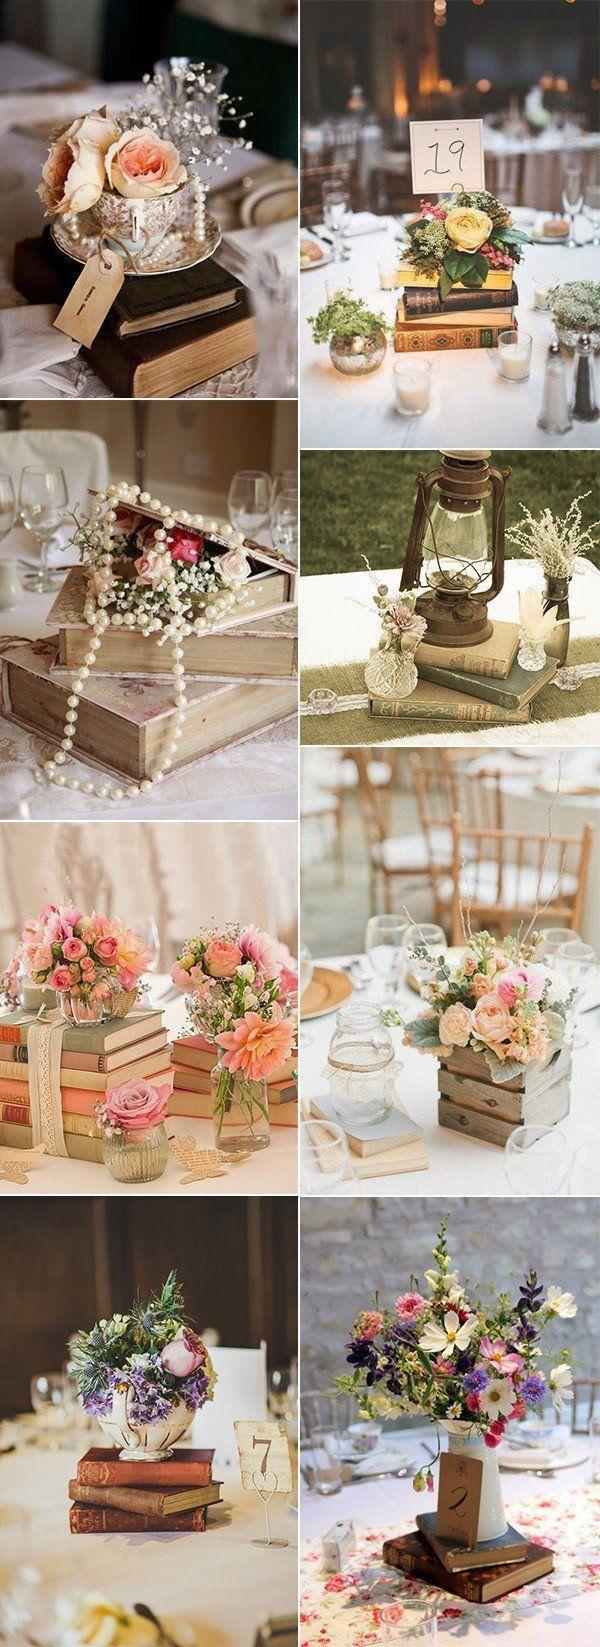 50 Fabulous Vintage Wedding Centerpiece Decoration Ideas - Oh Best Day Ever  | Vintage wedding centerpieces, Wedding decorations centerpieces, Vintage  wedding reception